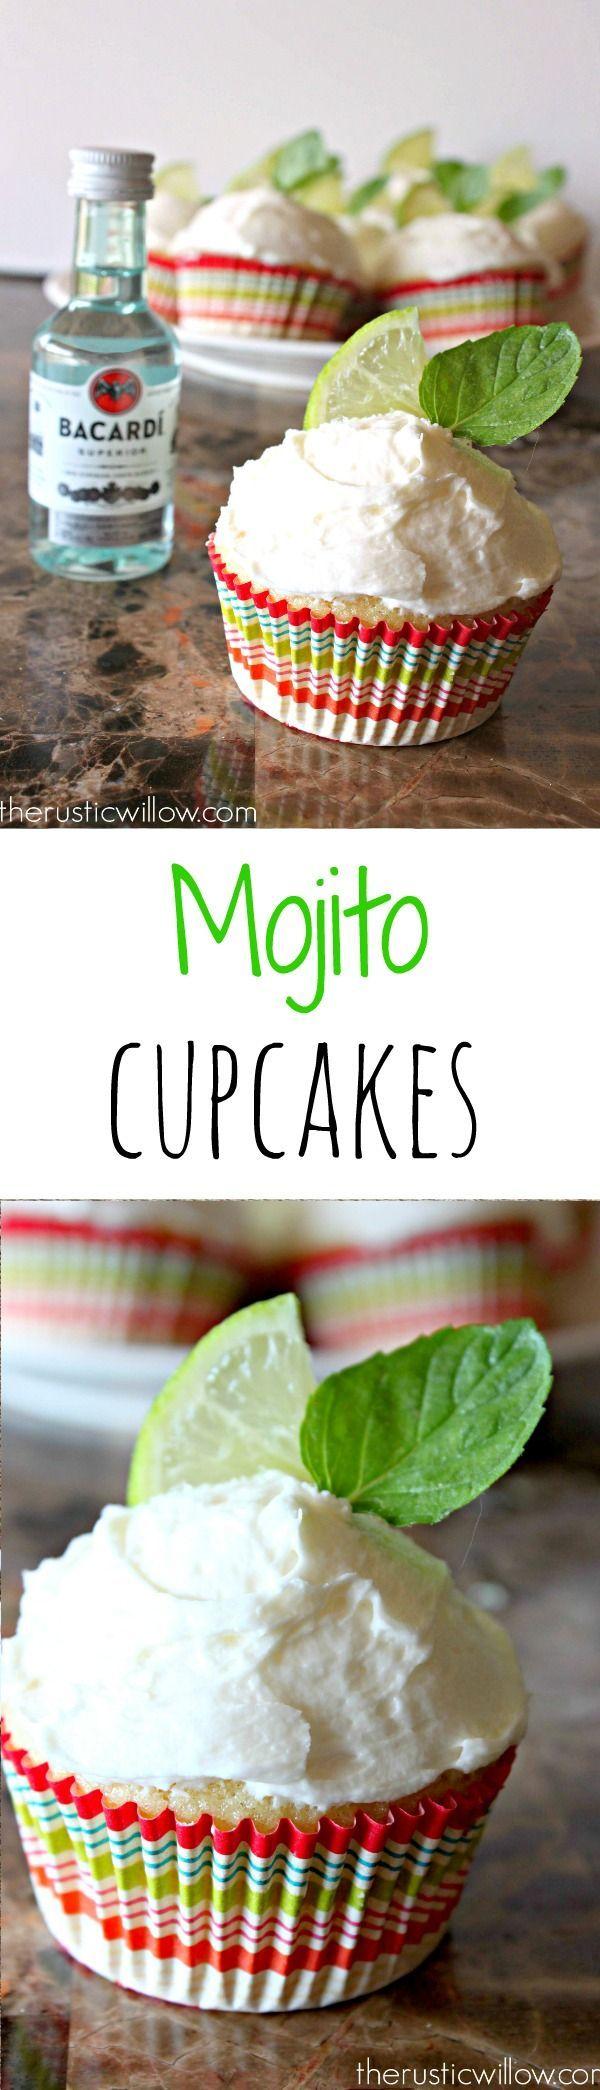 Mojito cupcakes | http://therusticwillow.com #mojito #cupcakes